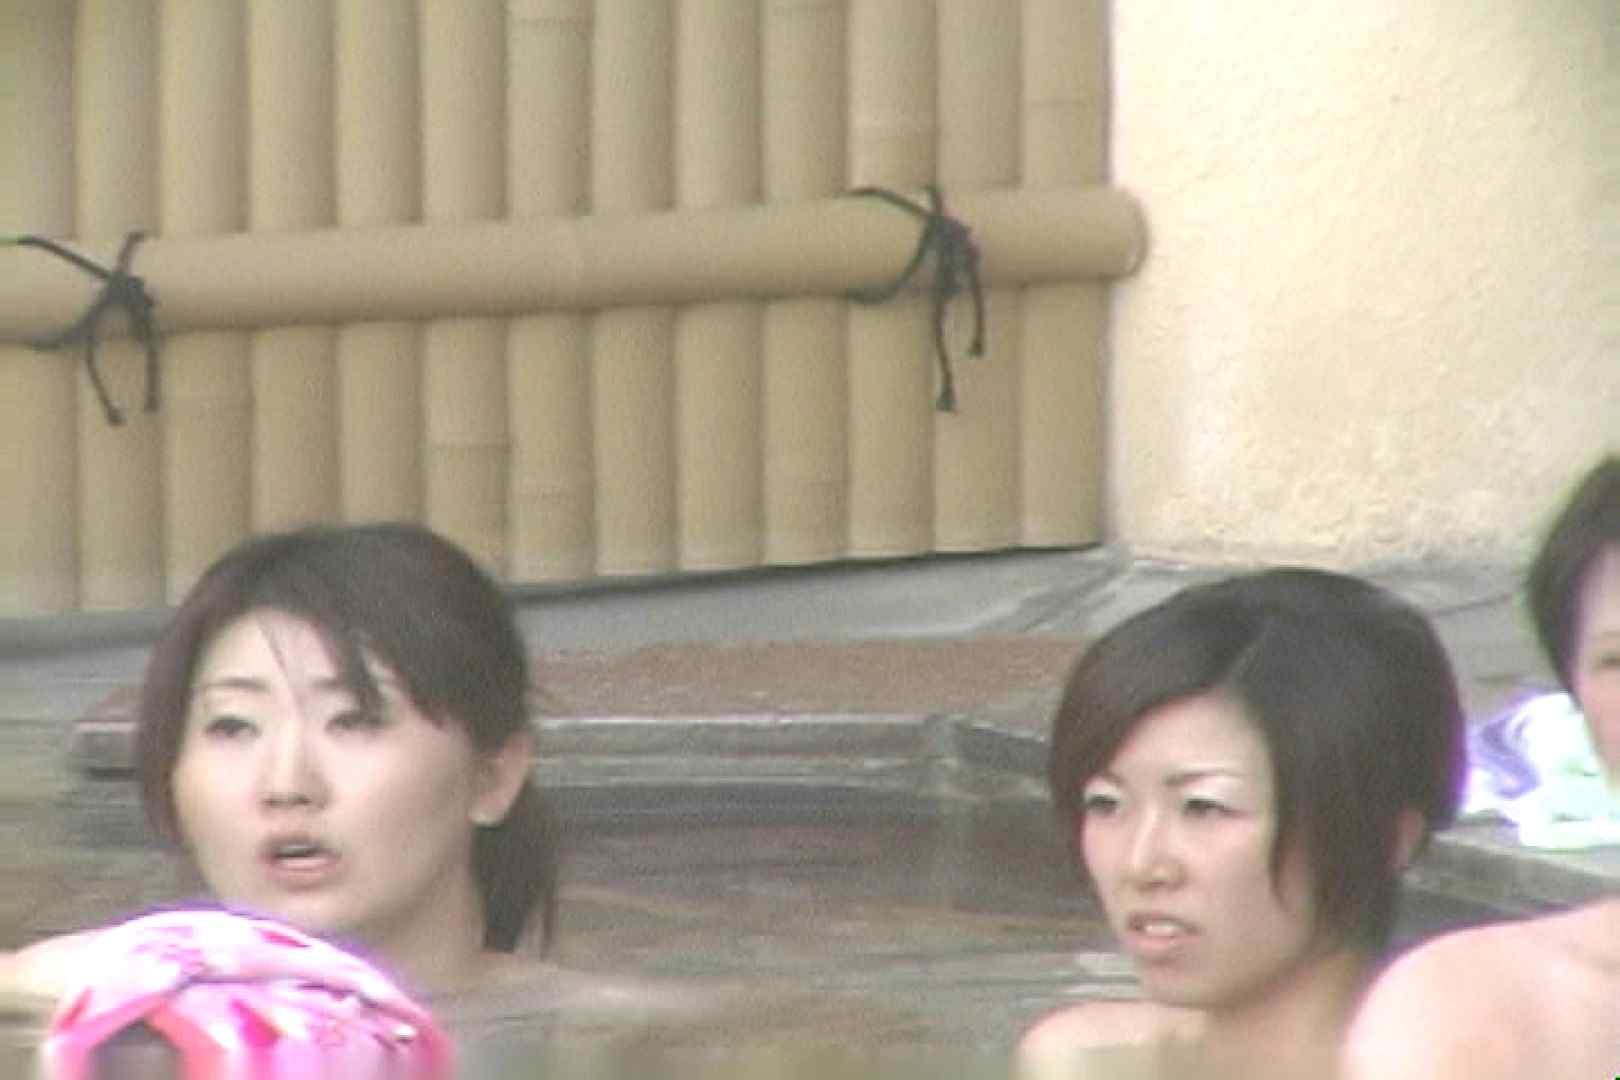 Aquaな露天風呂Vol.25 露天風呂編  91PIX 34